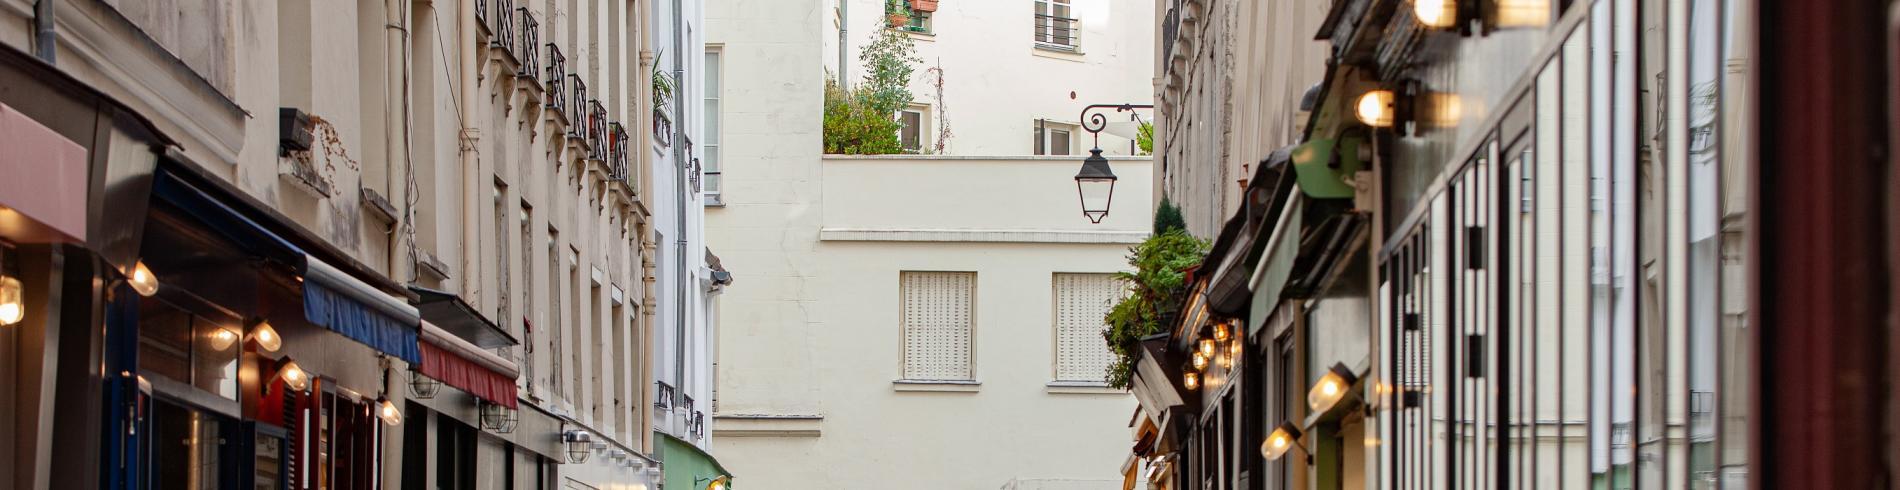 A street for gourmets: rue du Nil